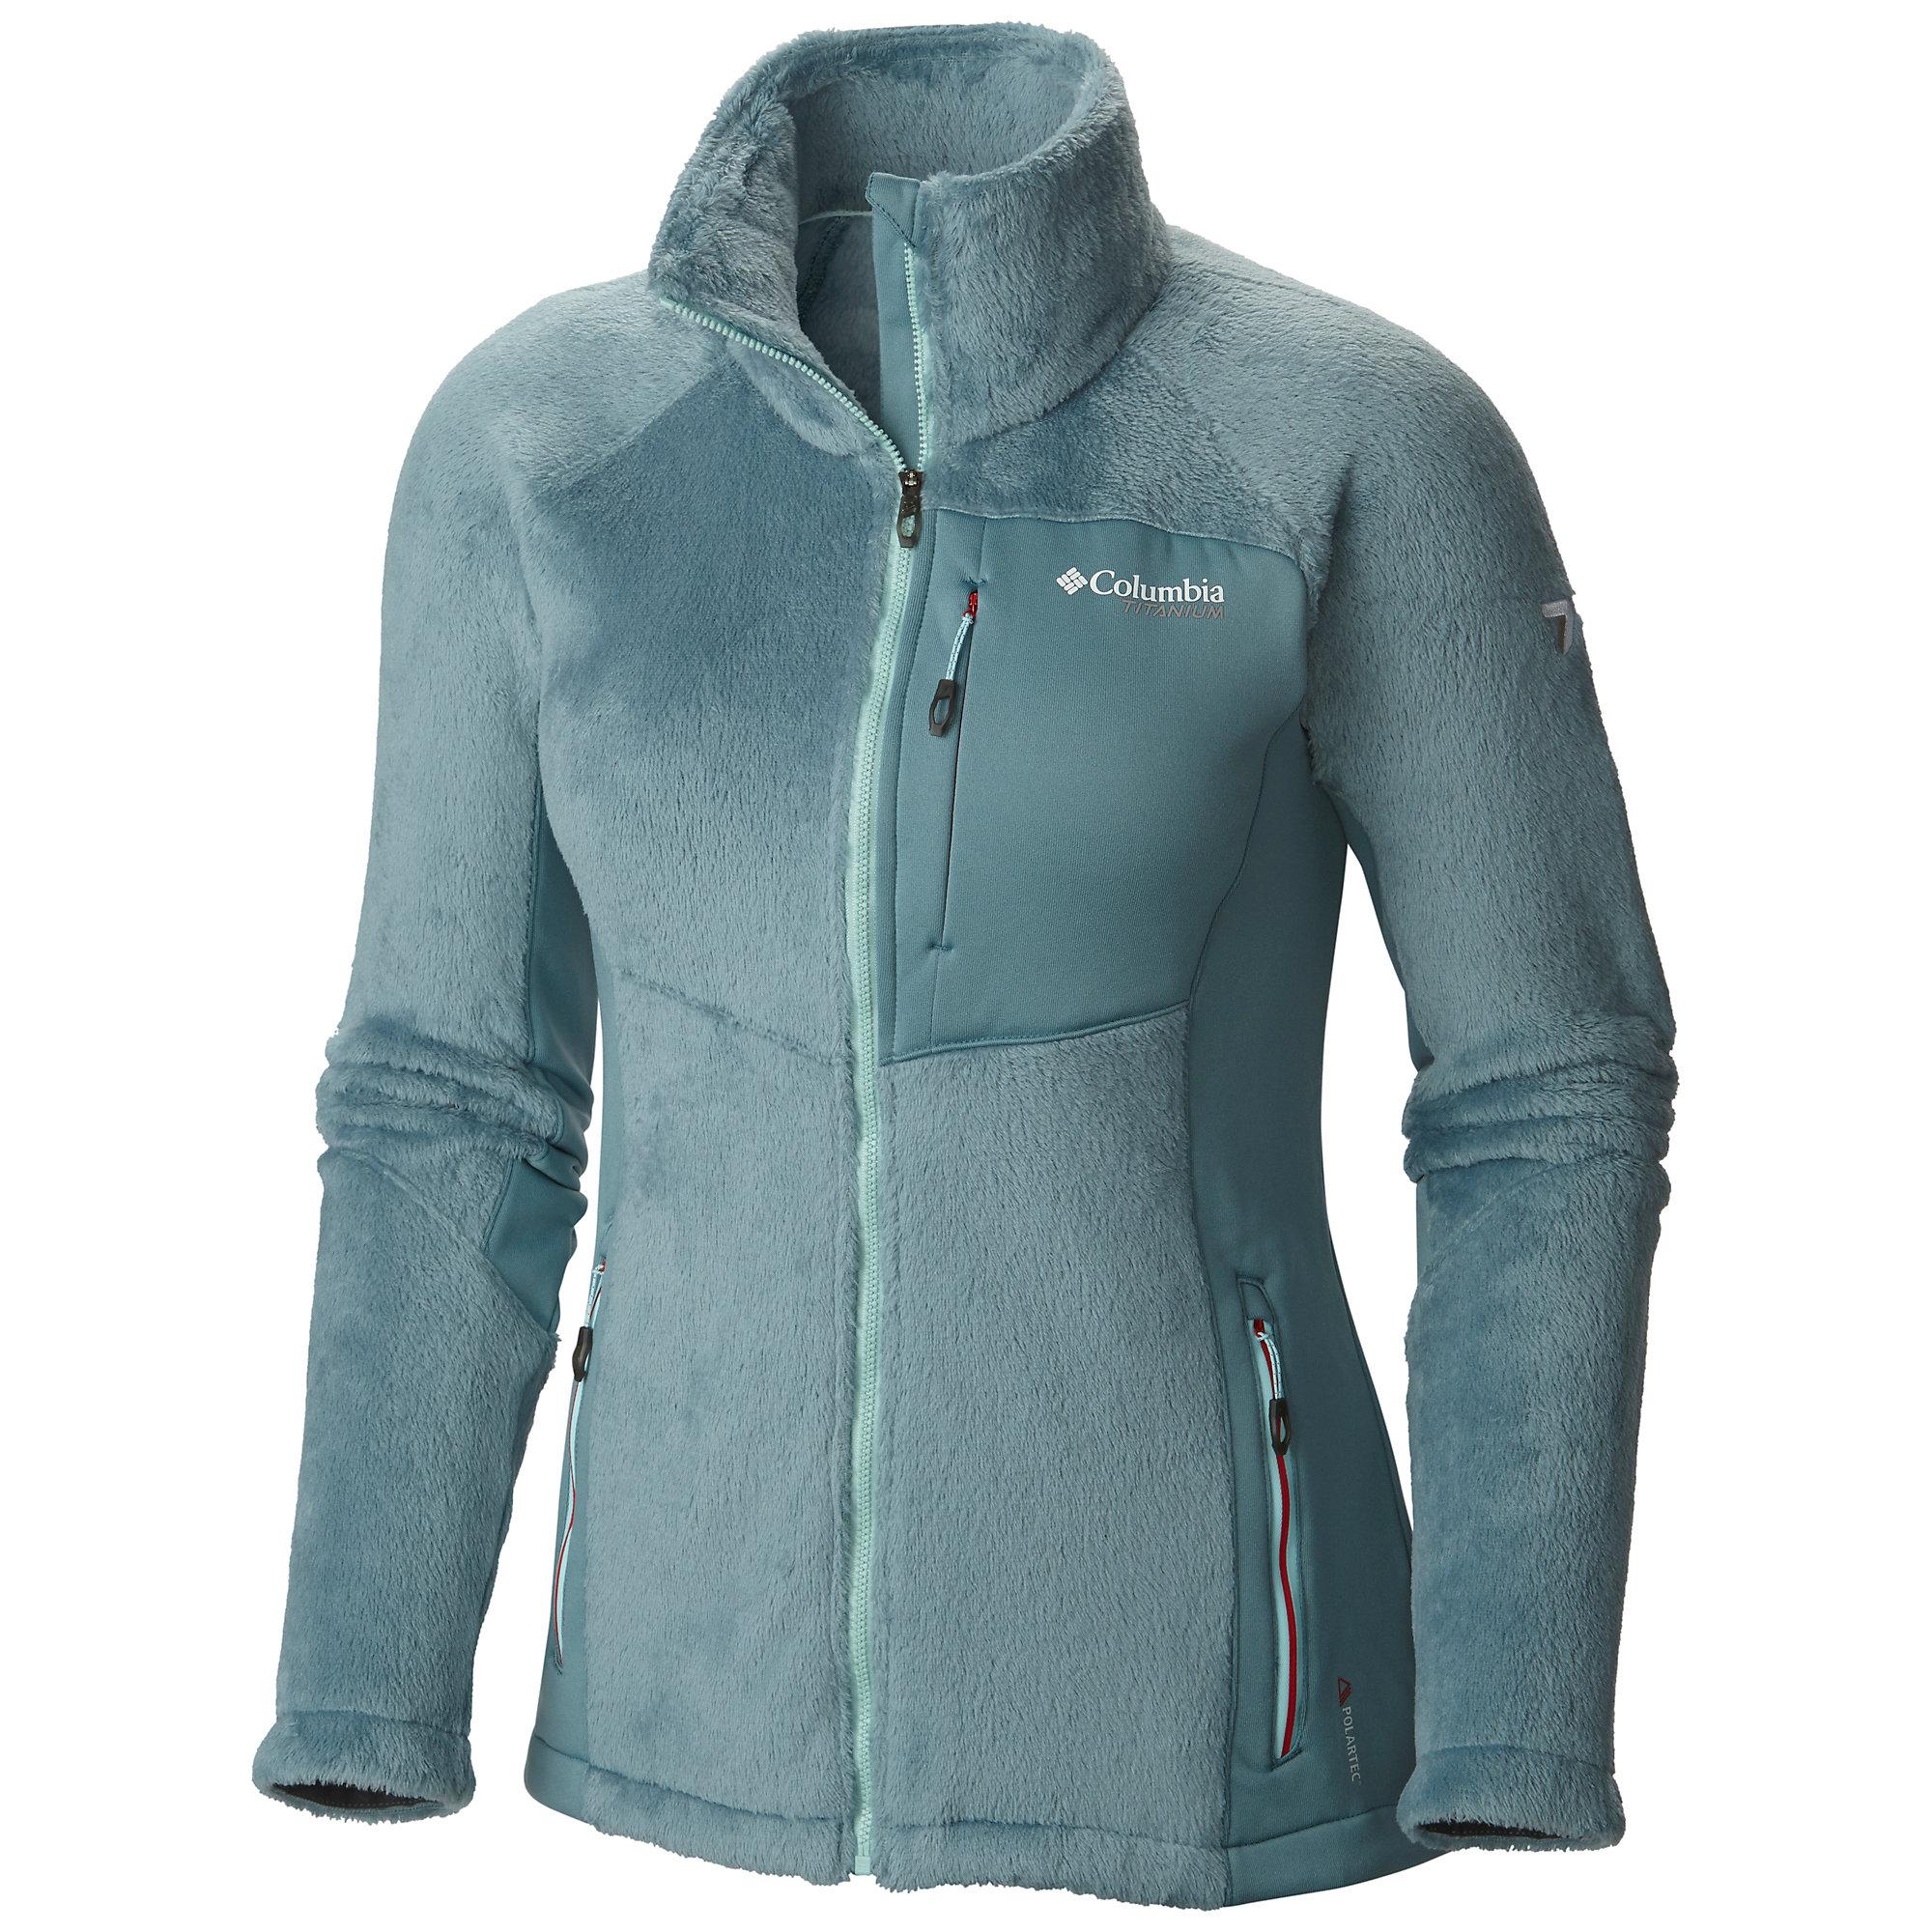 Columbia Polar Pass Fleece Jacket